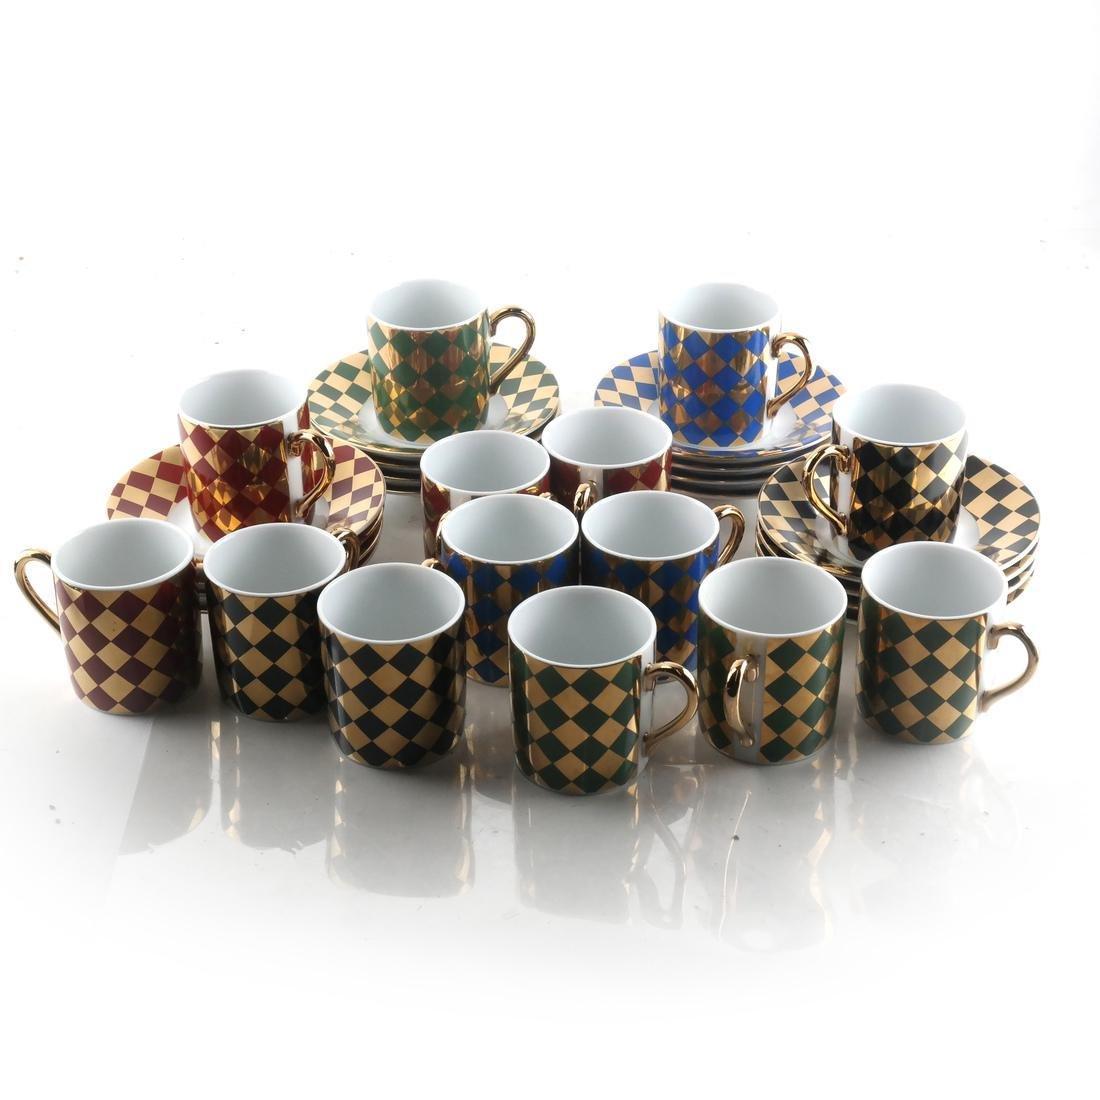 30 Pcs Japanese Porcelain Dishes